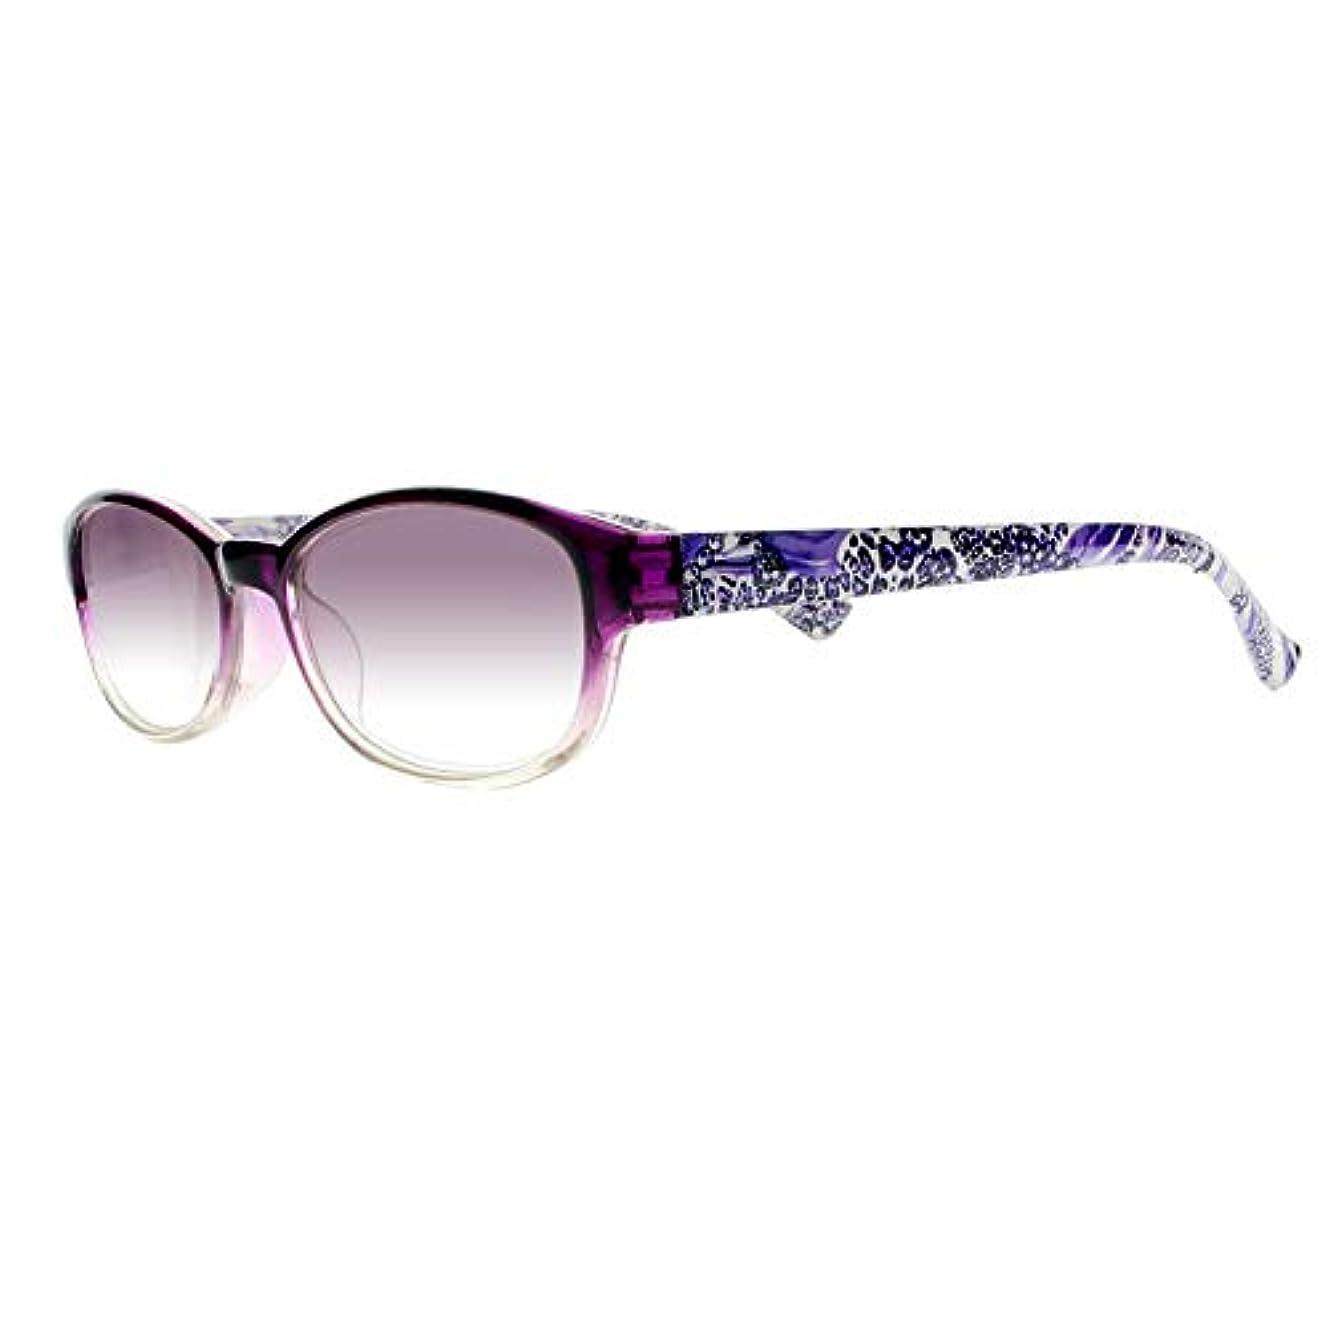 FidgetGear 女性フラワーティンテッドレンズリーダー老眼鏡アイウェア+1.00?+4.00 New 紫の